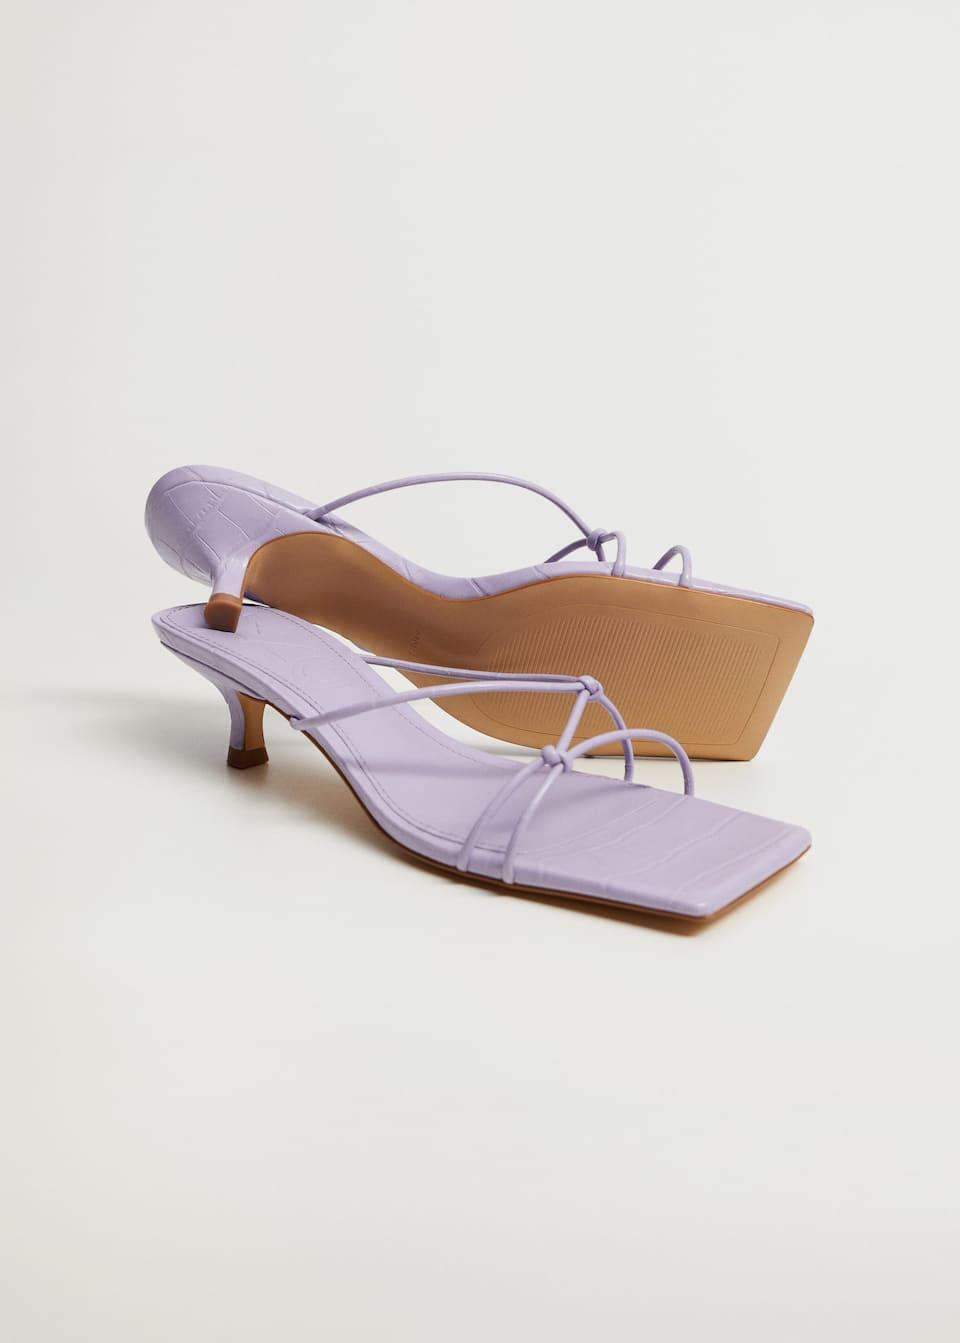 Knots heel sandals - Medium plane